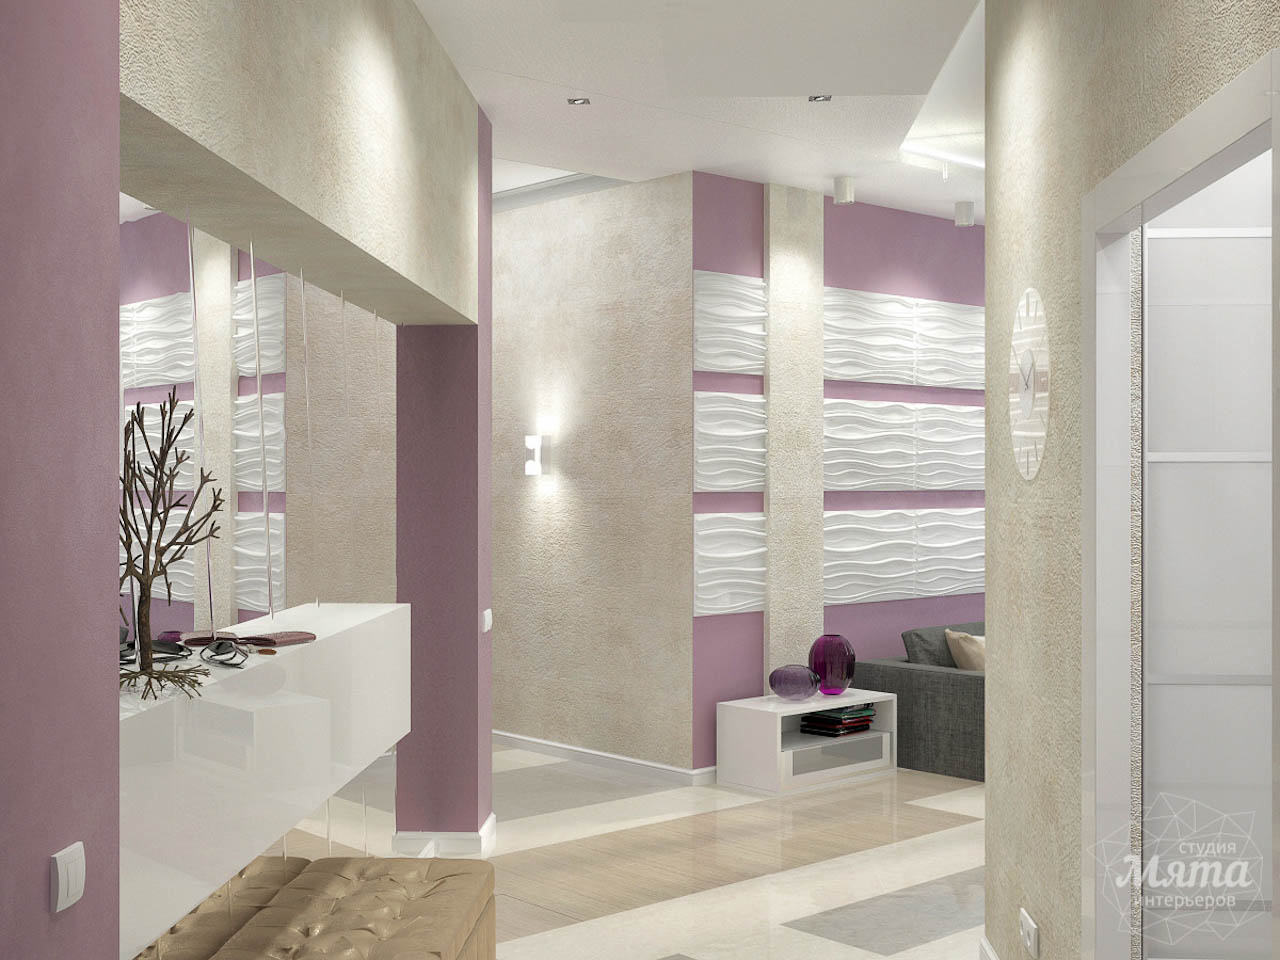 Дизайн интерьера и ремонт трехкомнатной квартиры по ул. Чкалова 124 img731277963